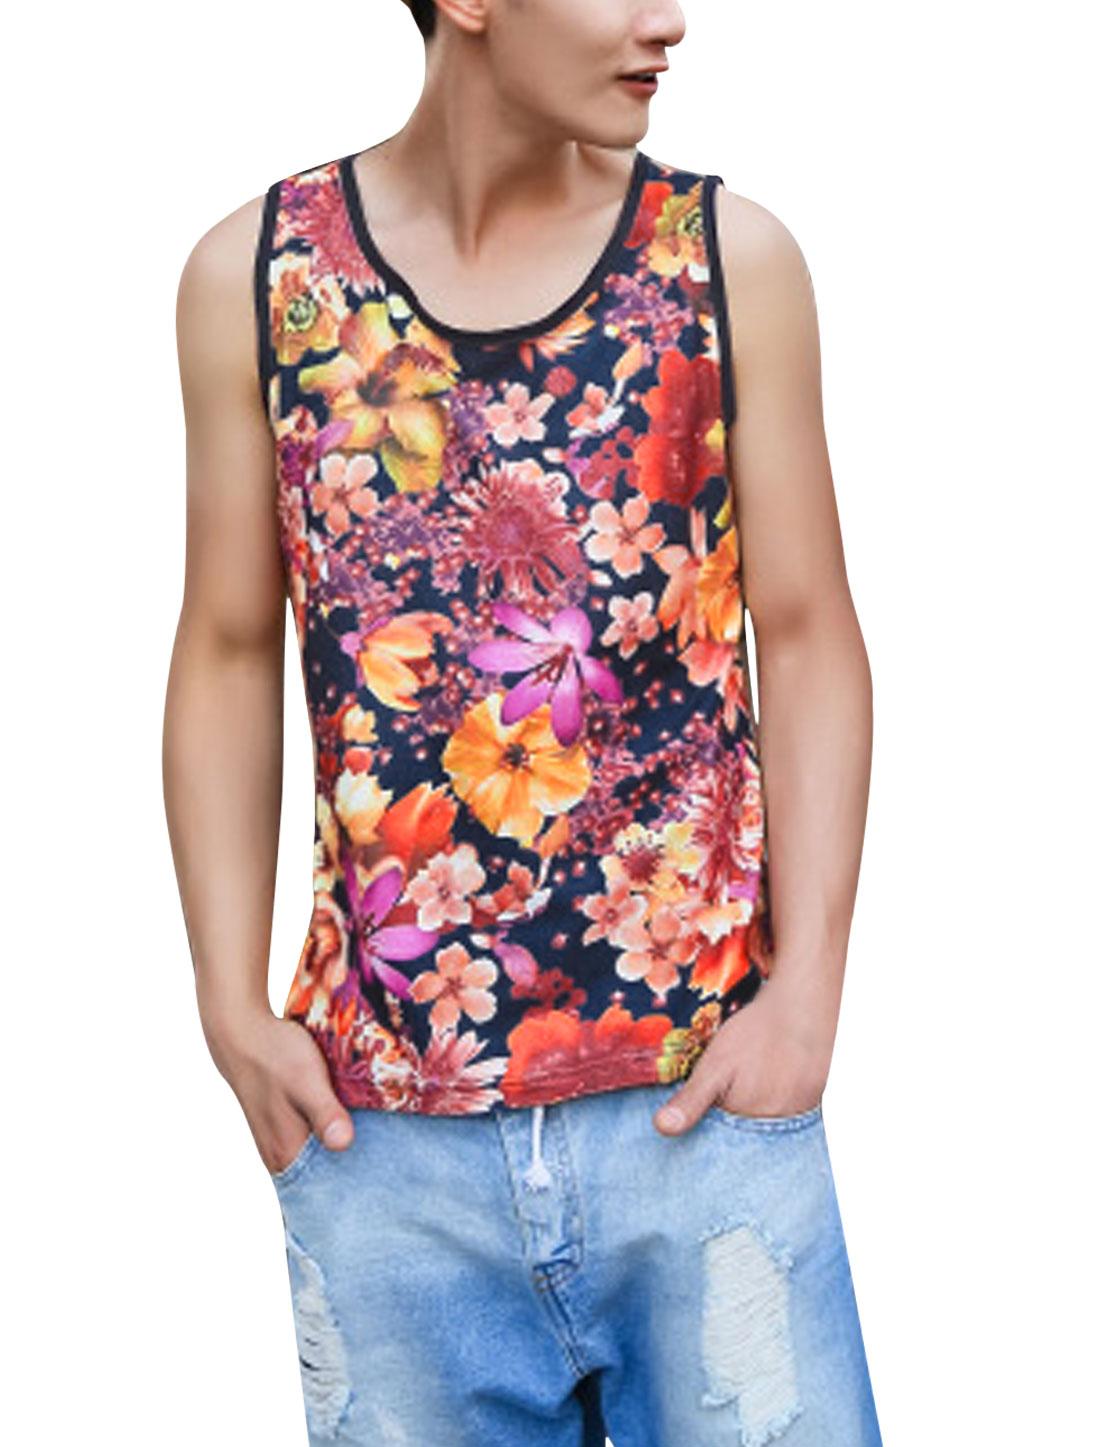 Men's Sleeveless Flower Pattern Summer Fit Tank Top Multicolor M